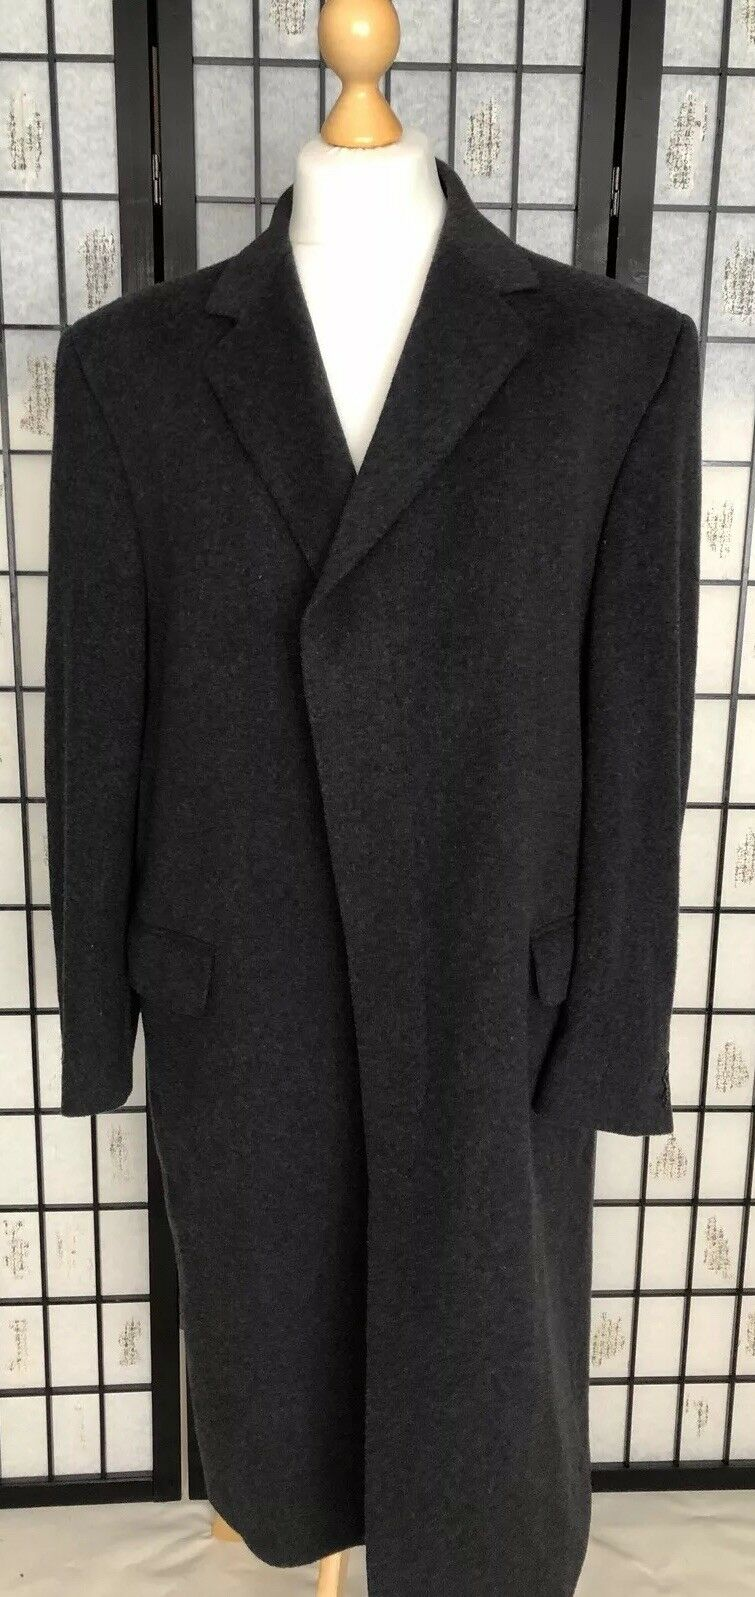 Dehavilland De havilland grau Charcoal Cashmere Wool Overcoat Coat Coat Coat Large XL 44R   Attraktive Mode  142536